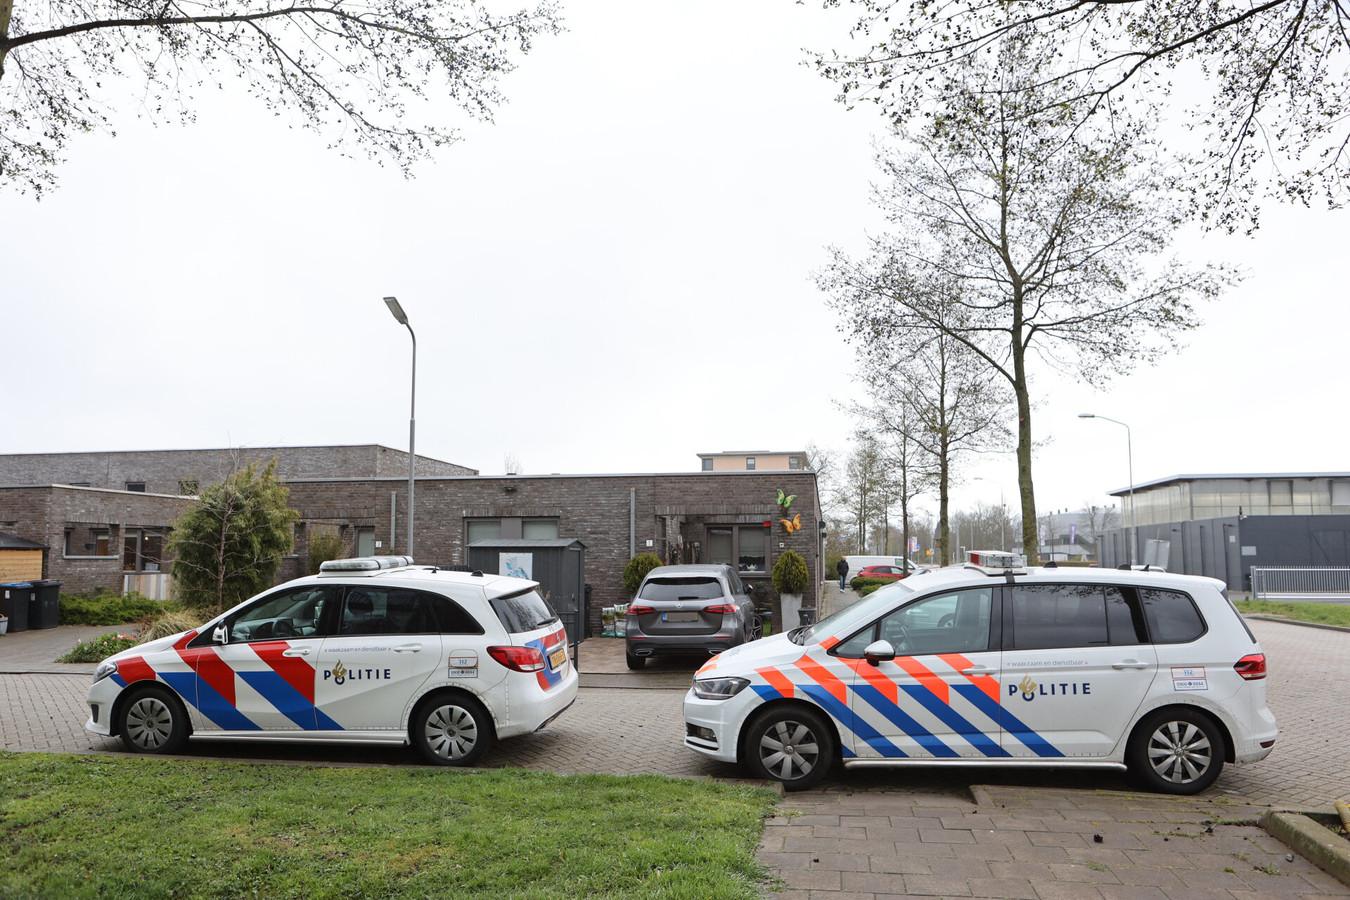 Woningoverval op de Weddestede in Den Bosch mislukt.